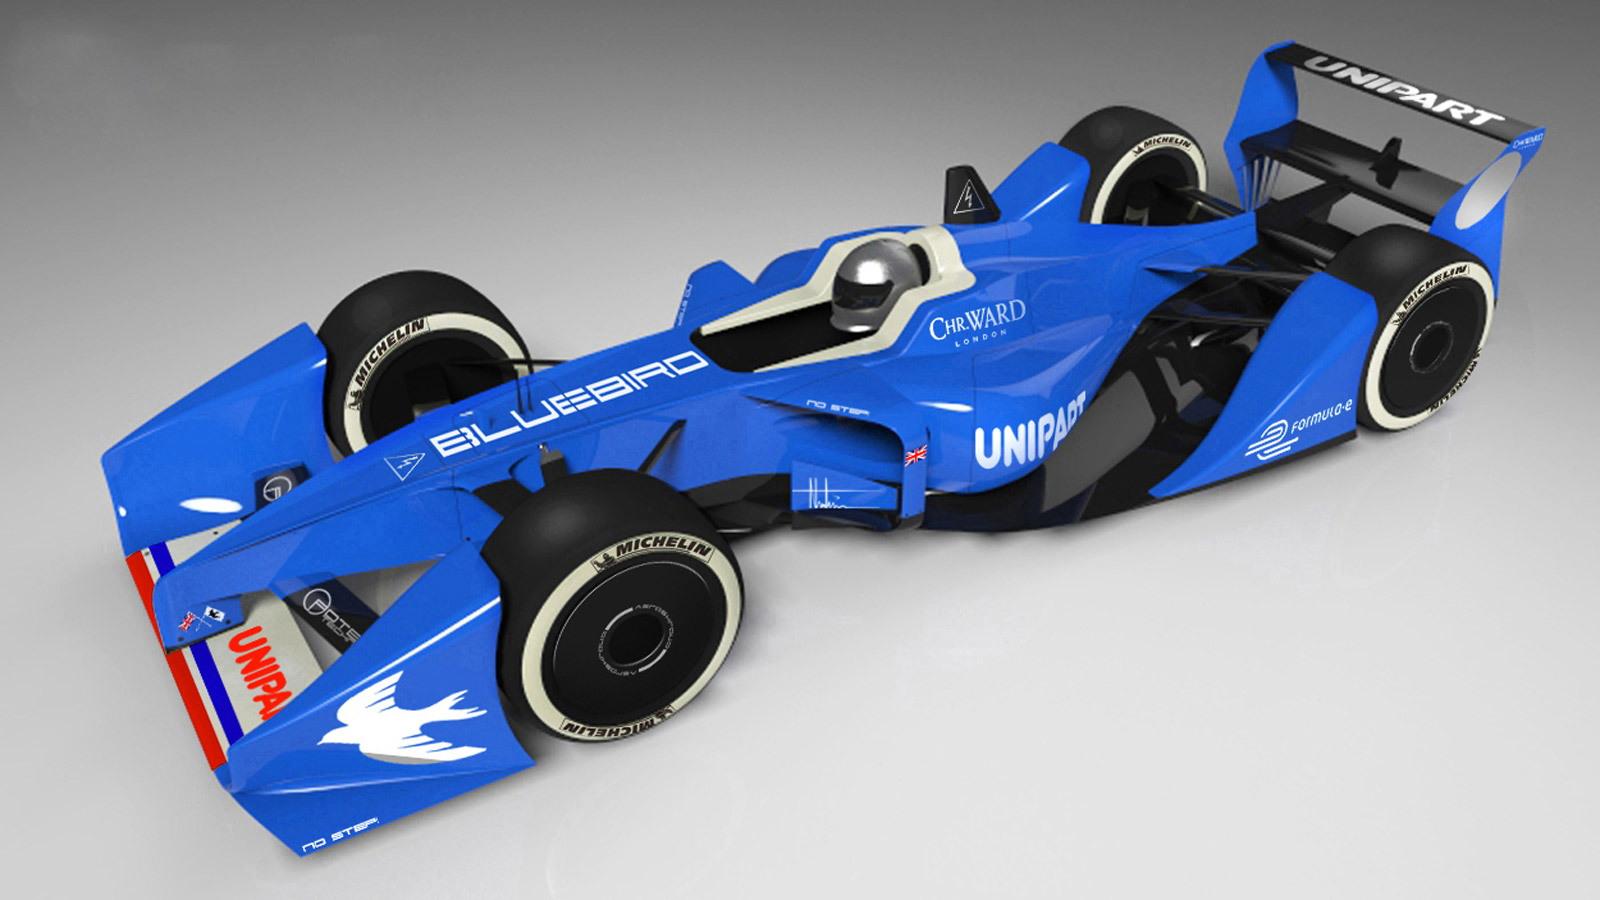 Bluebird GTL Formula E race car